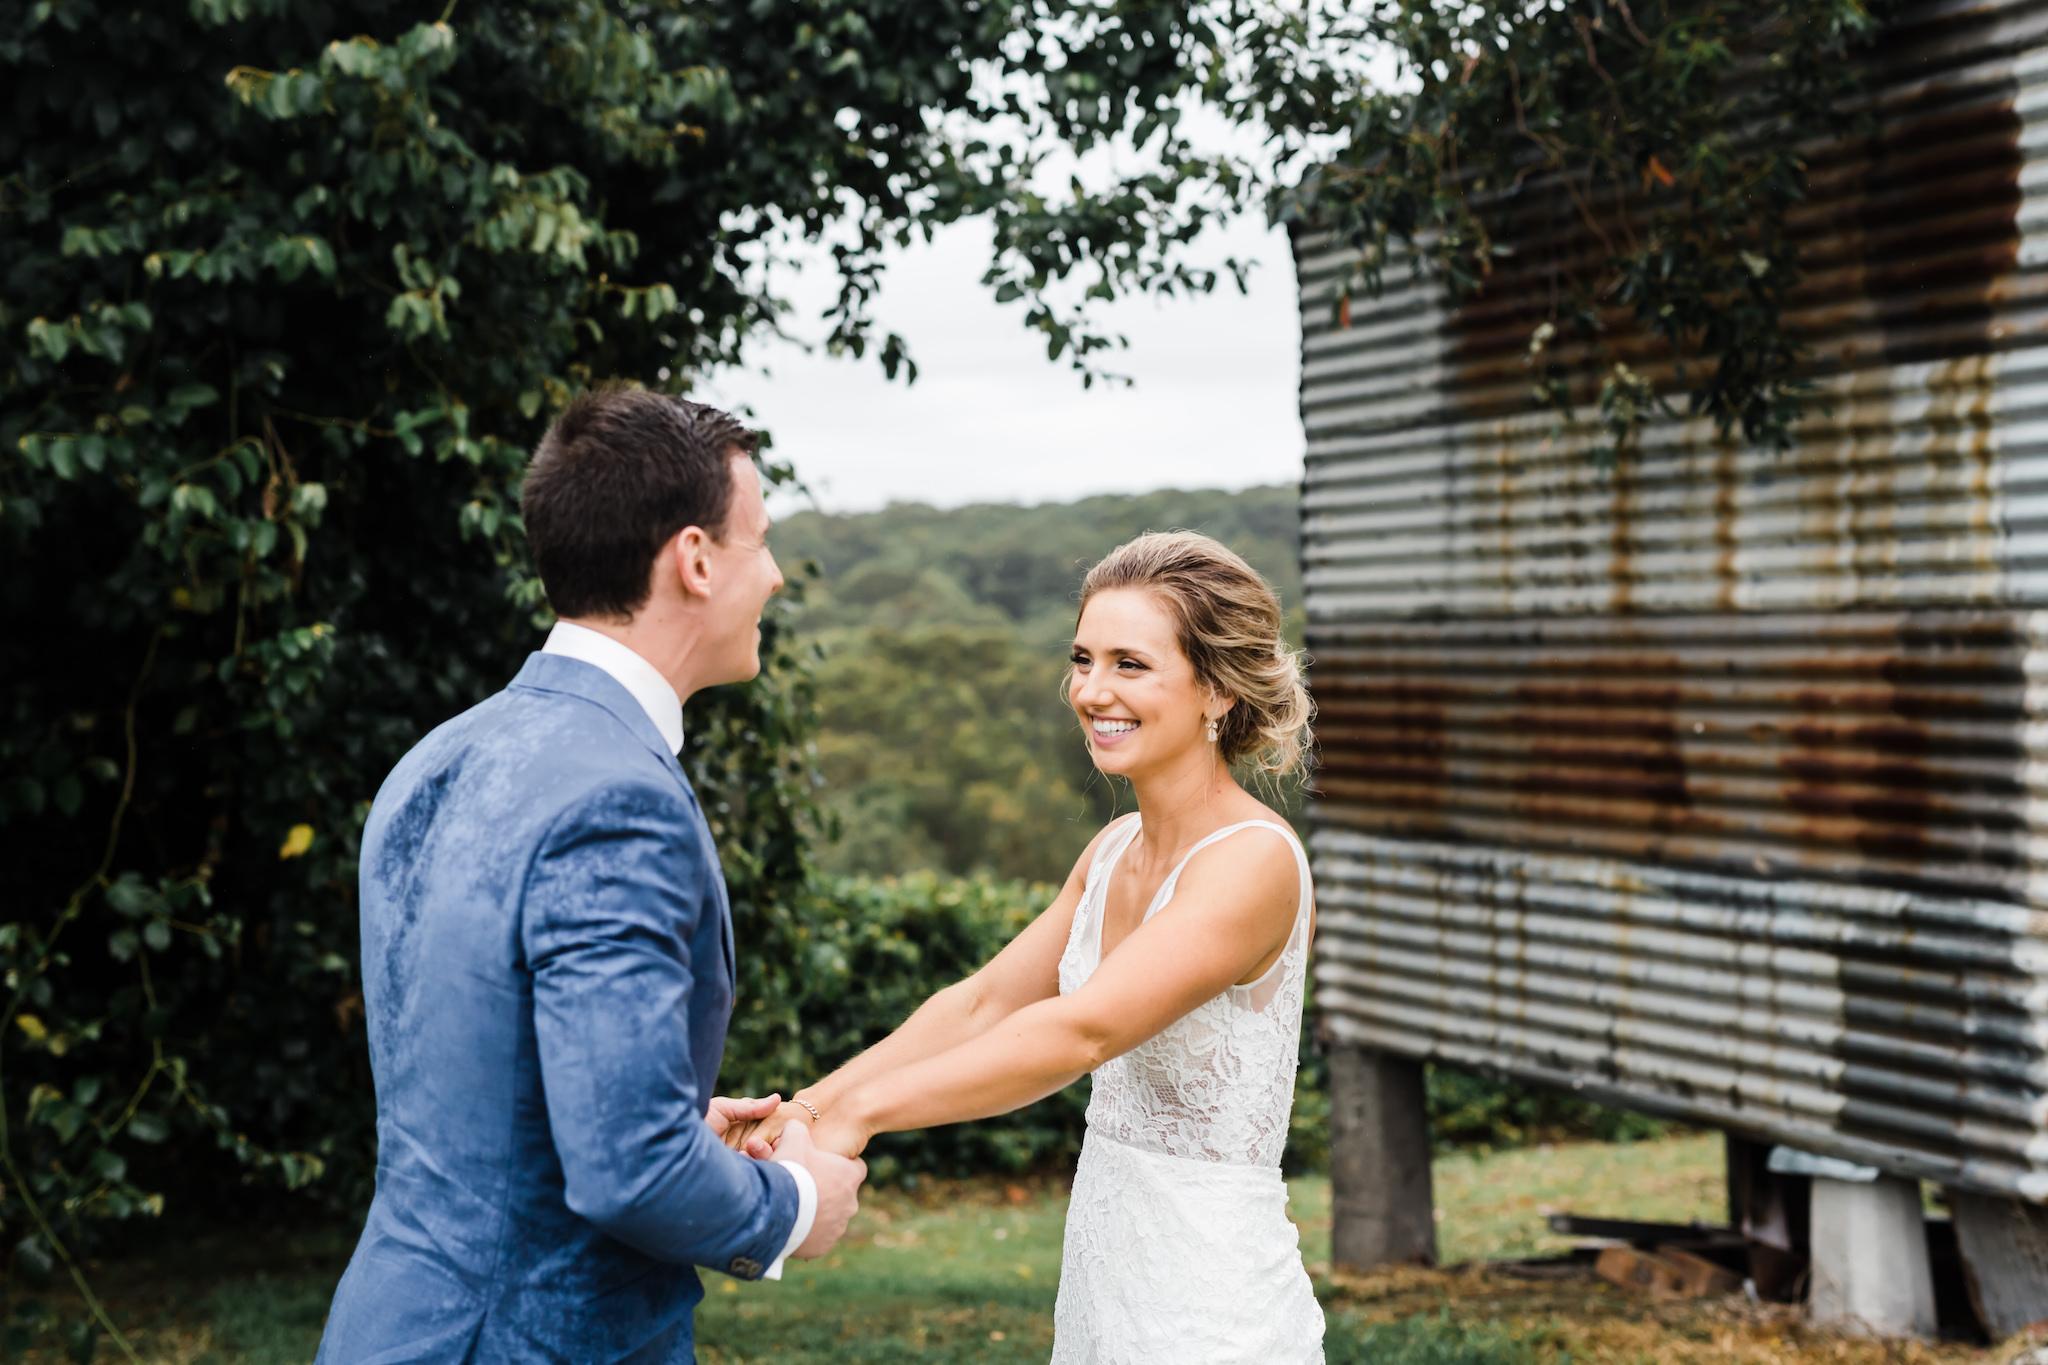 698-SOPHIE  DYLAN WEDDING.jpg